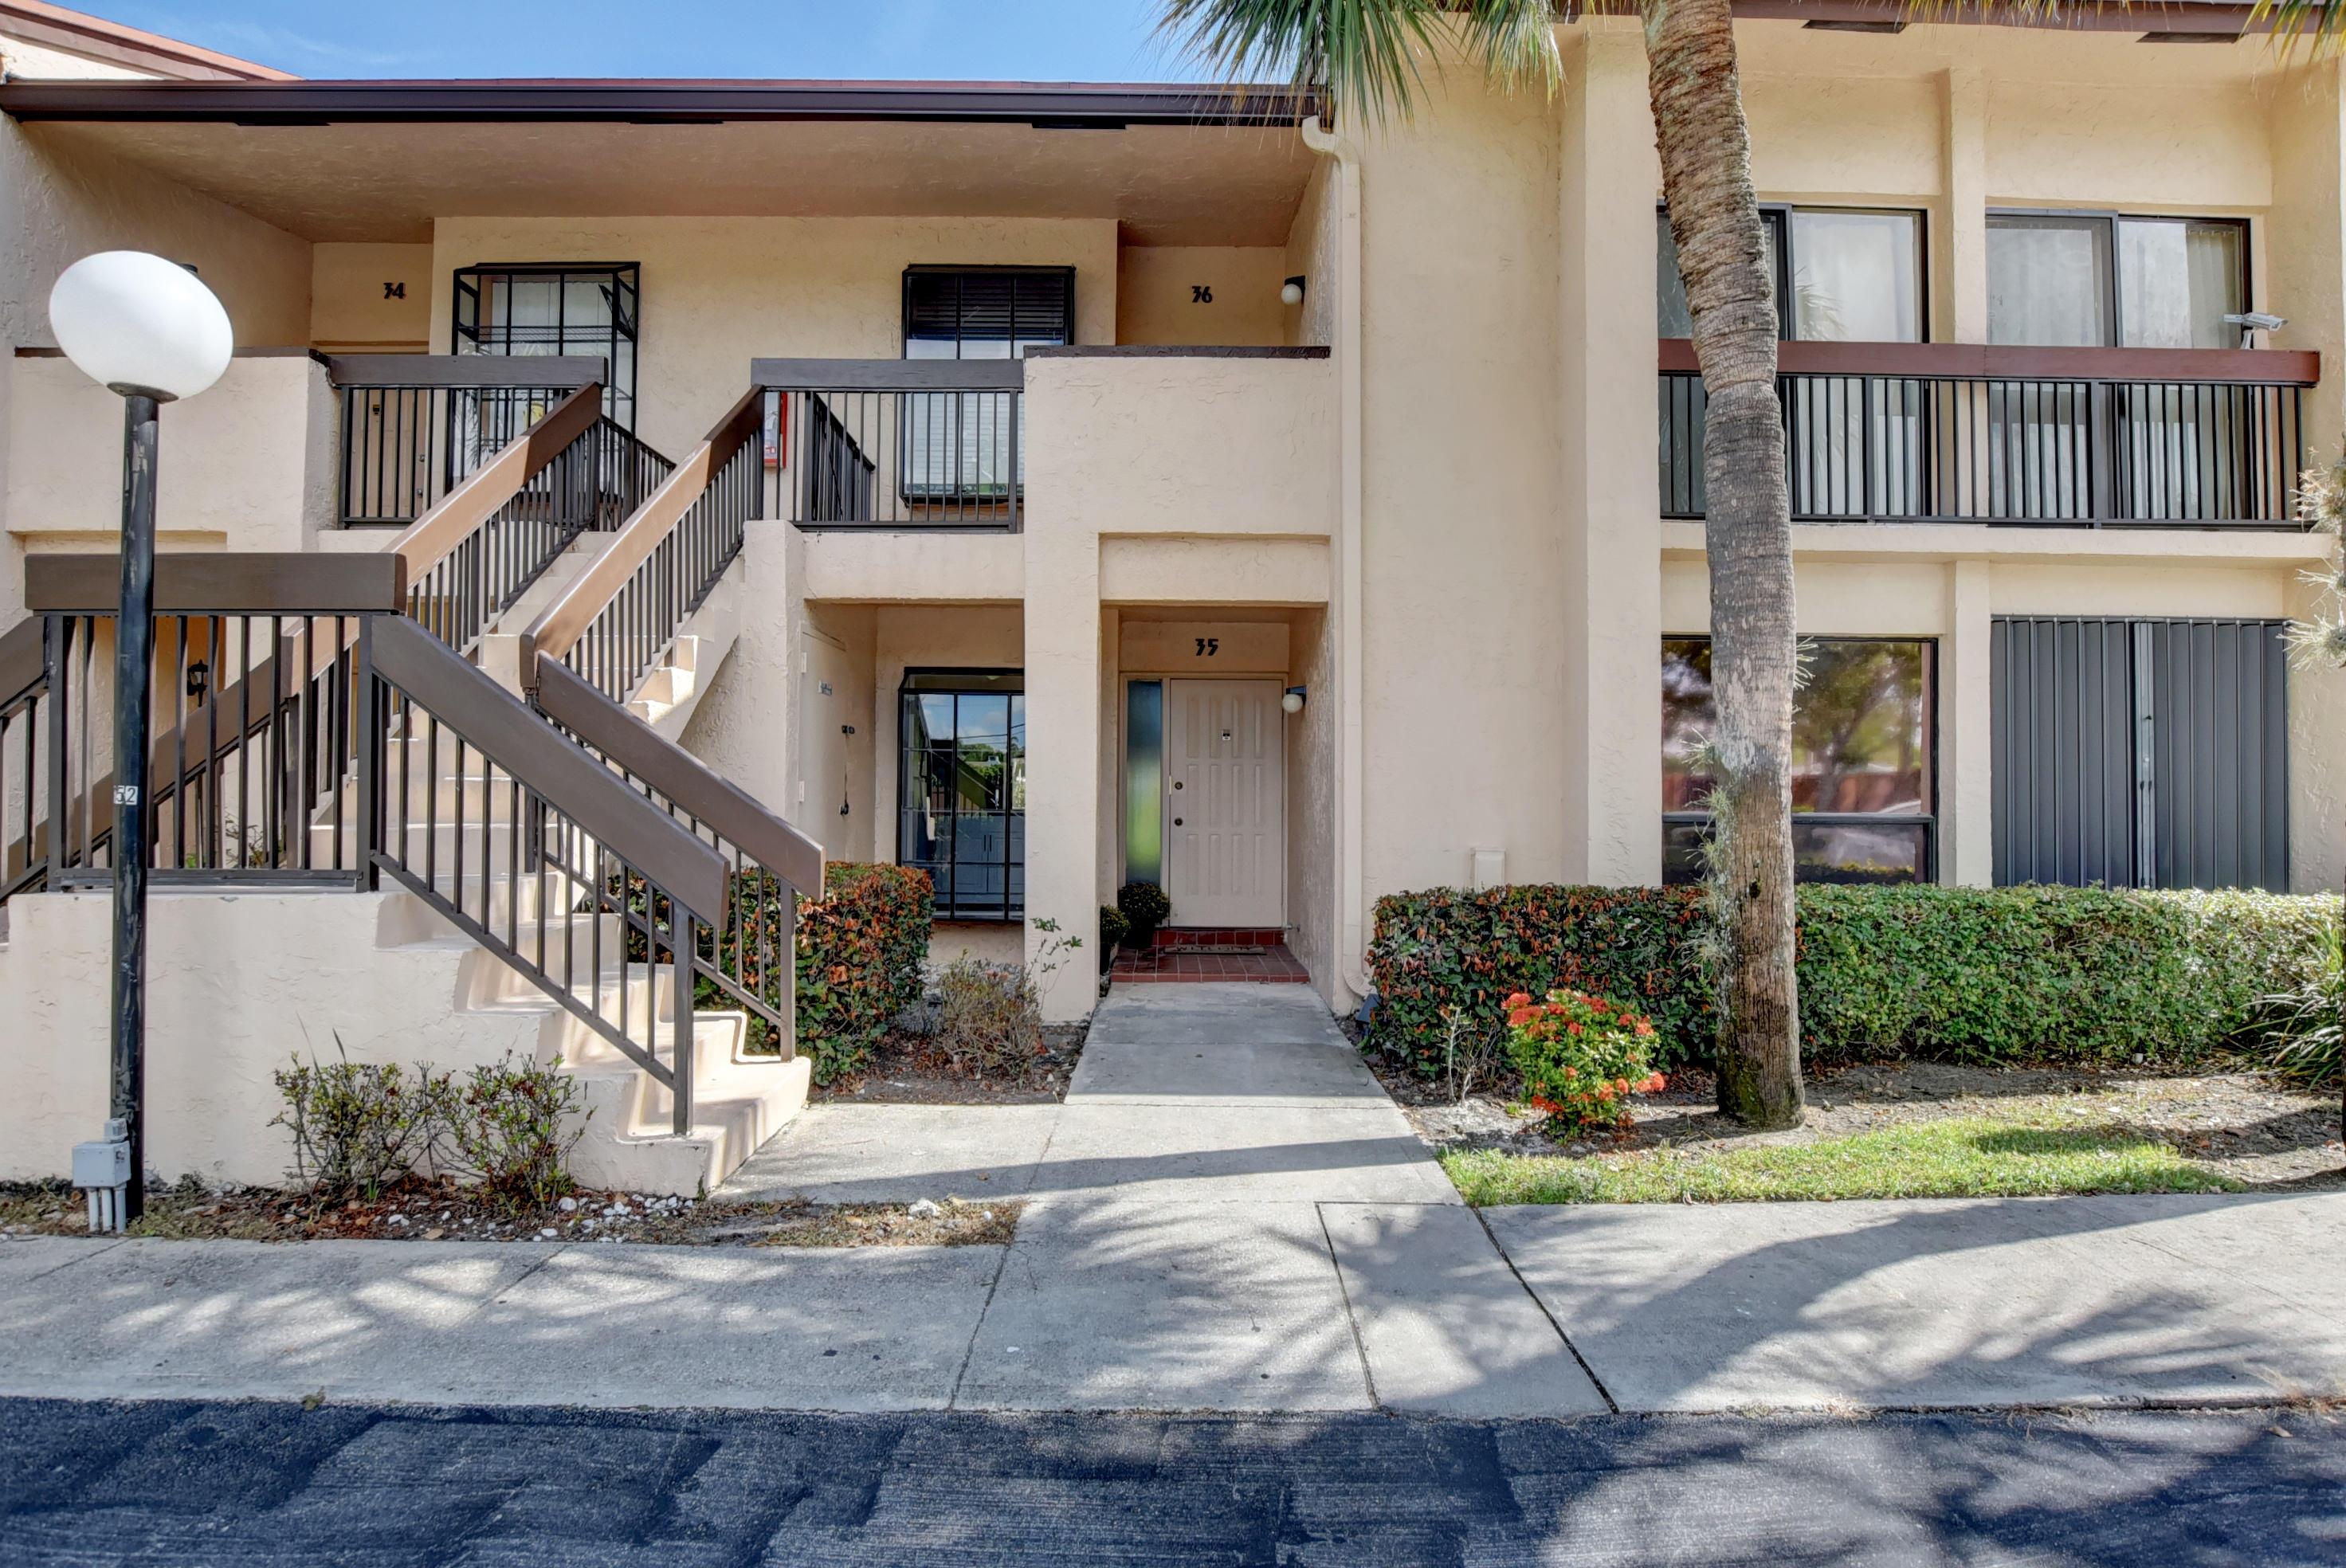 2331 SW 15th Street, 35 - Deerfield Beach, Florida